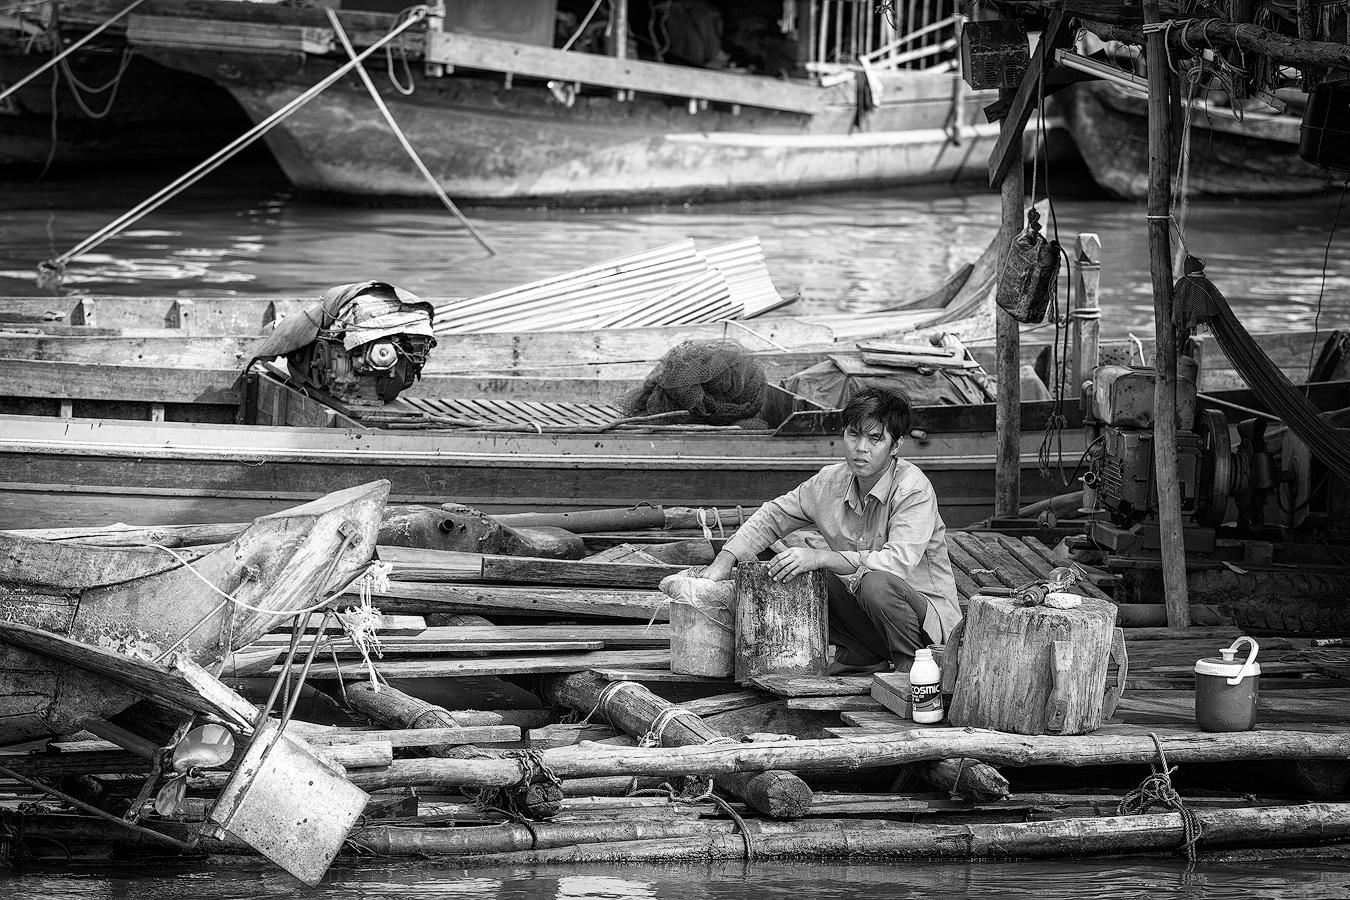 Lifeon the Tonle Sap.jpg